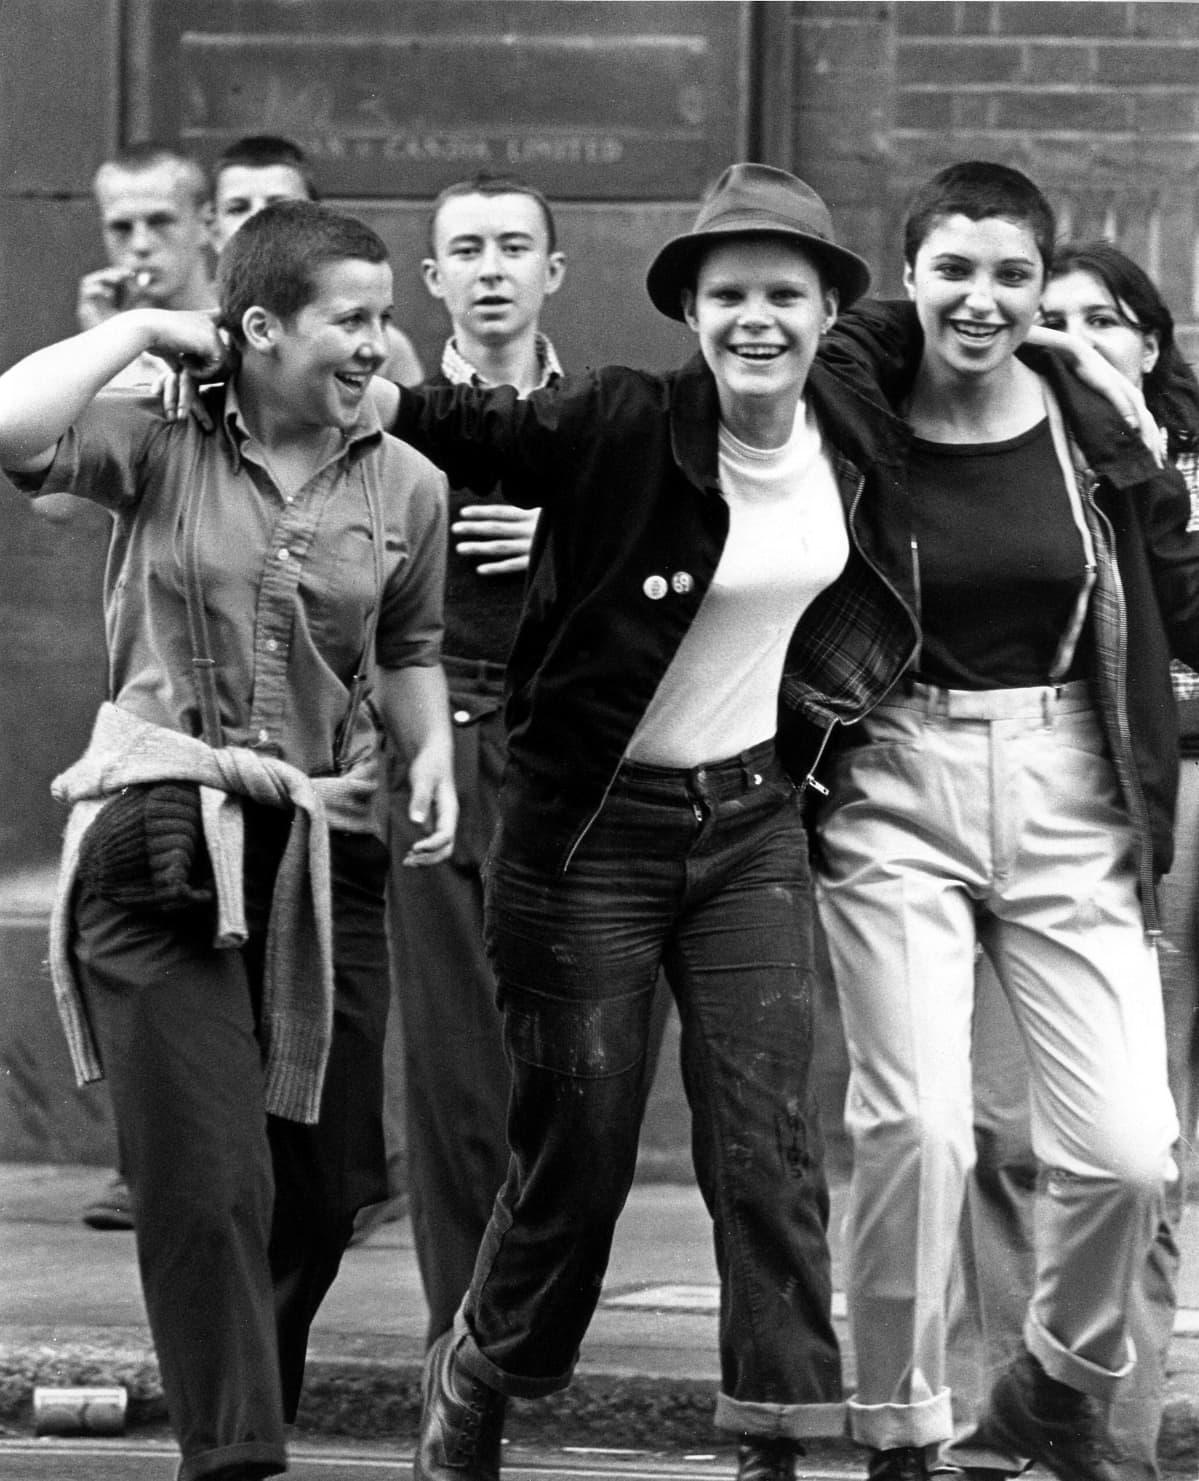 Punkkareita v.1975